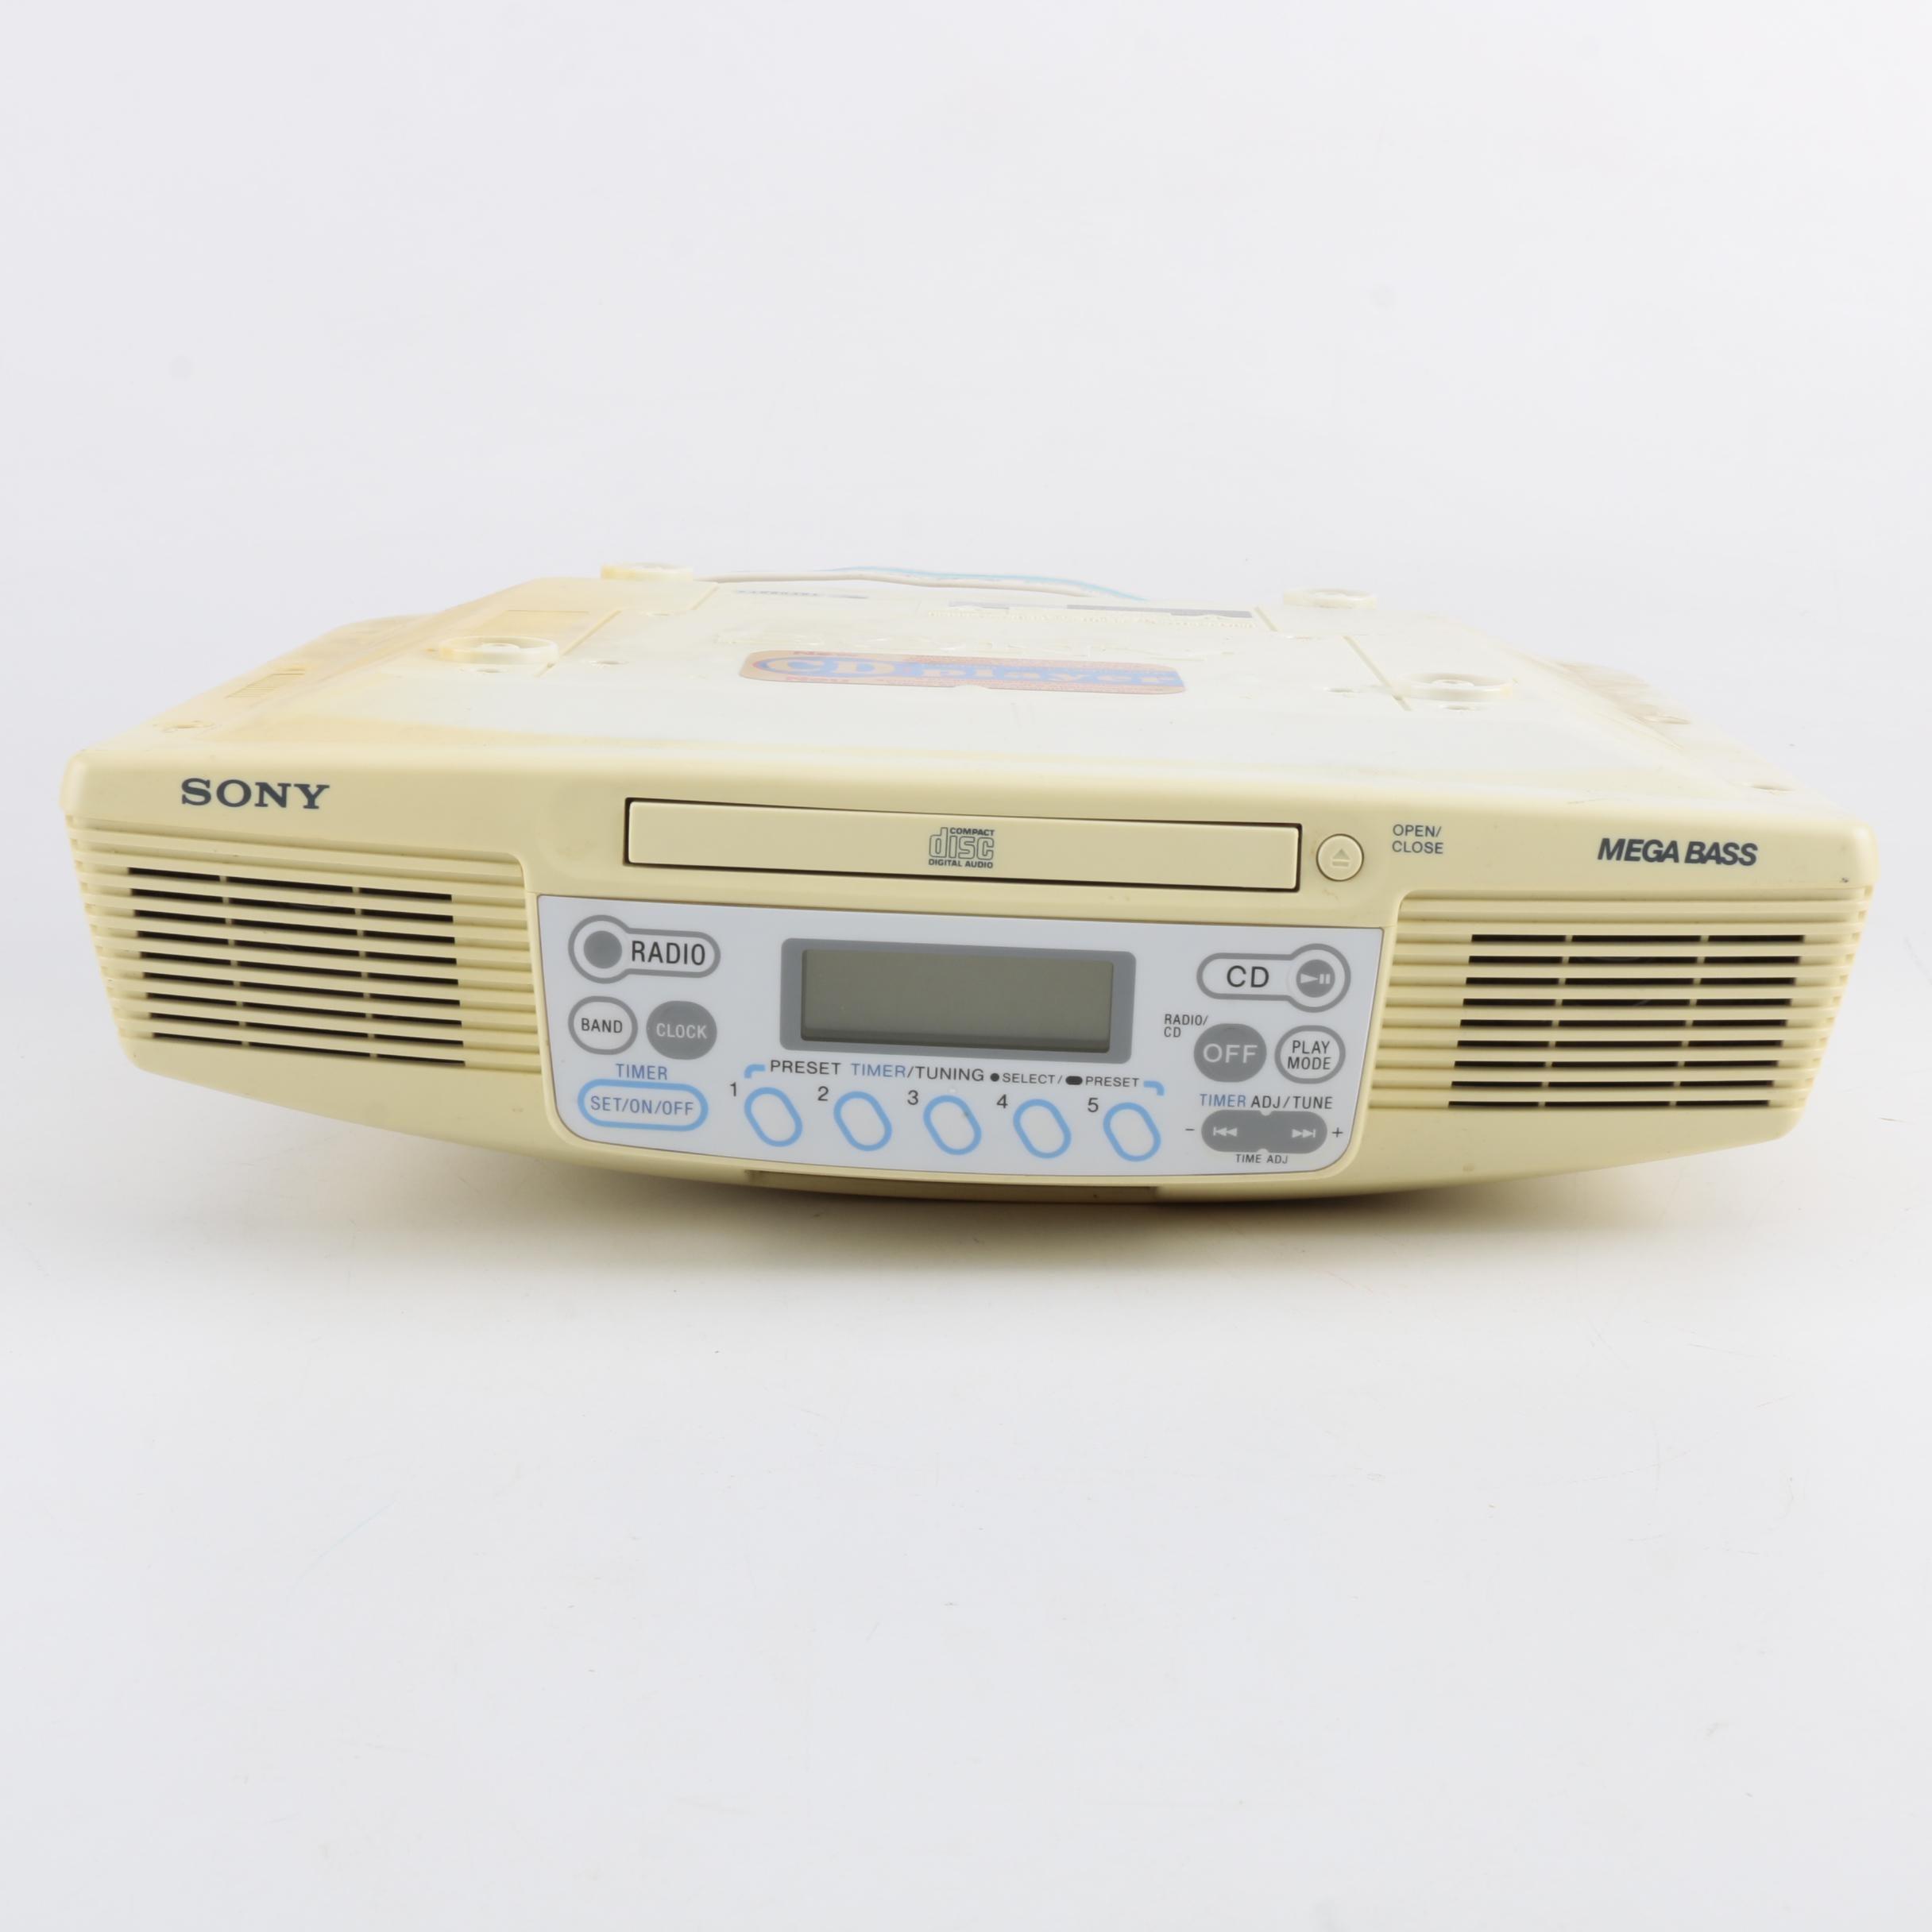 Sony Mega Bass CD and Radio Player